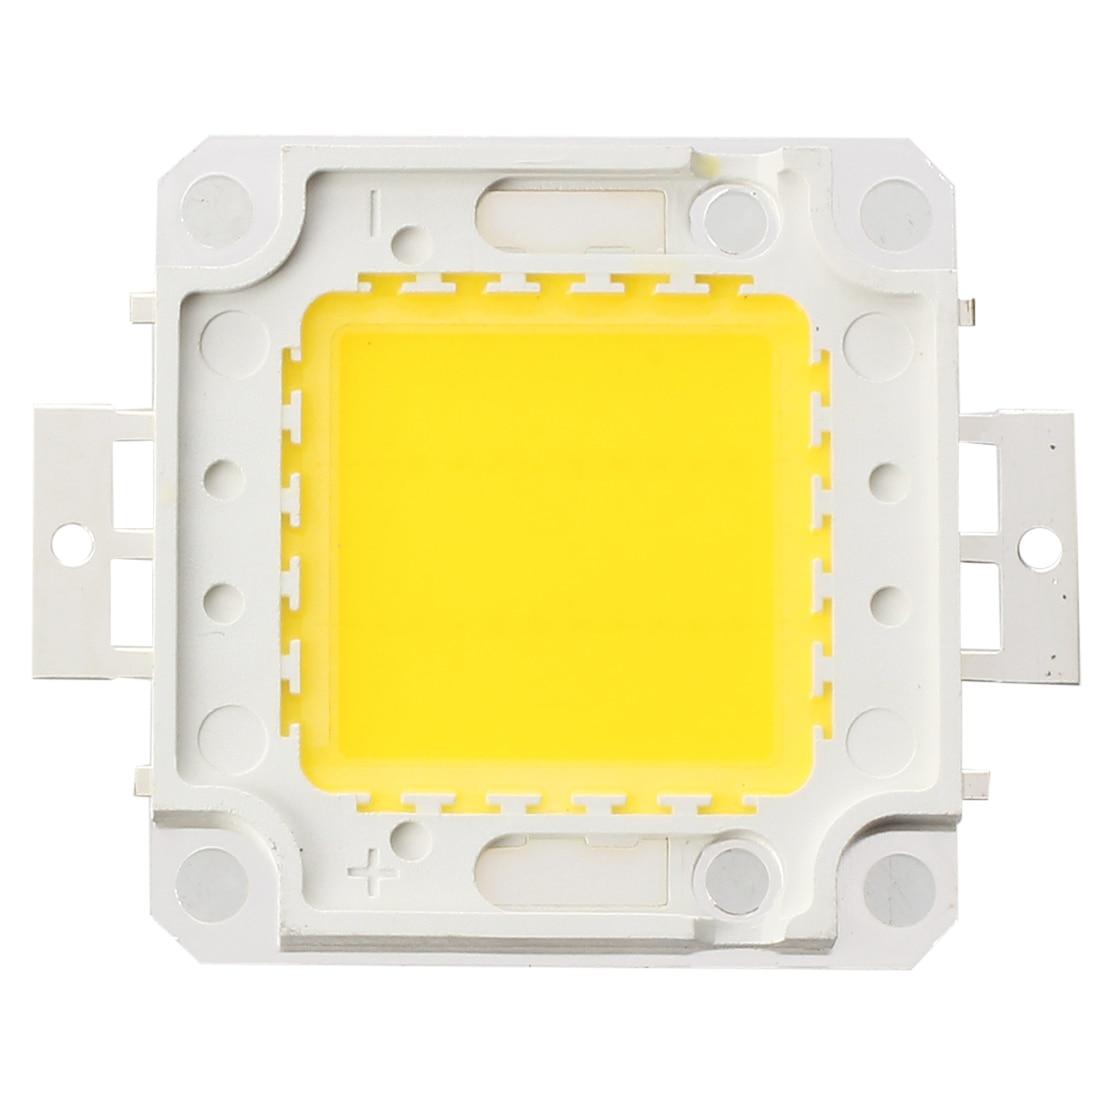 High Power 20W LED Chip Bulb Light Lamp DIY Warm White 1500LM 3000K